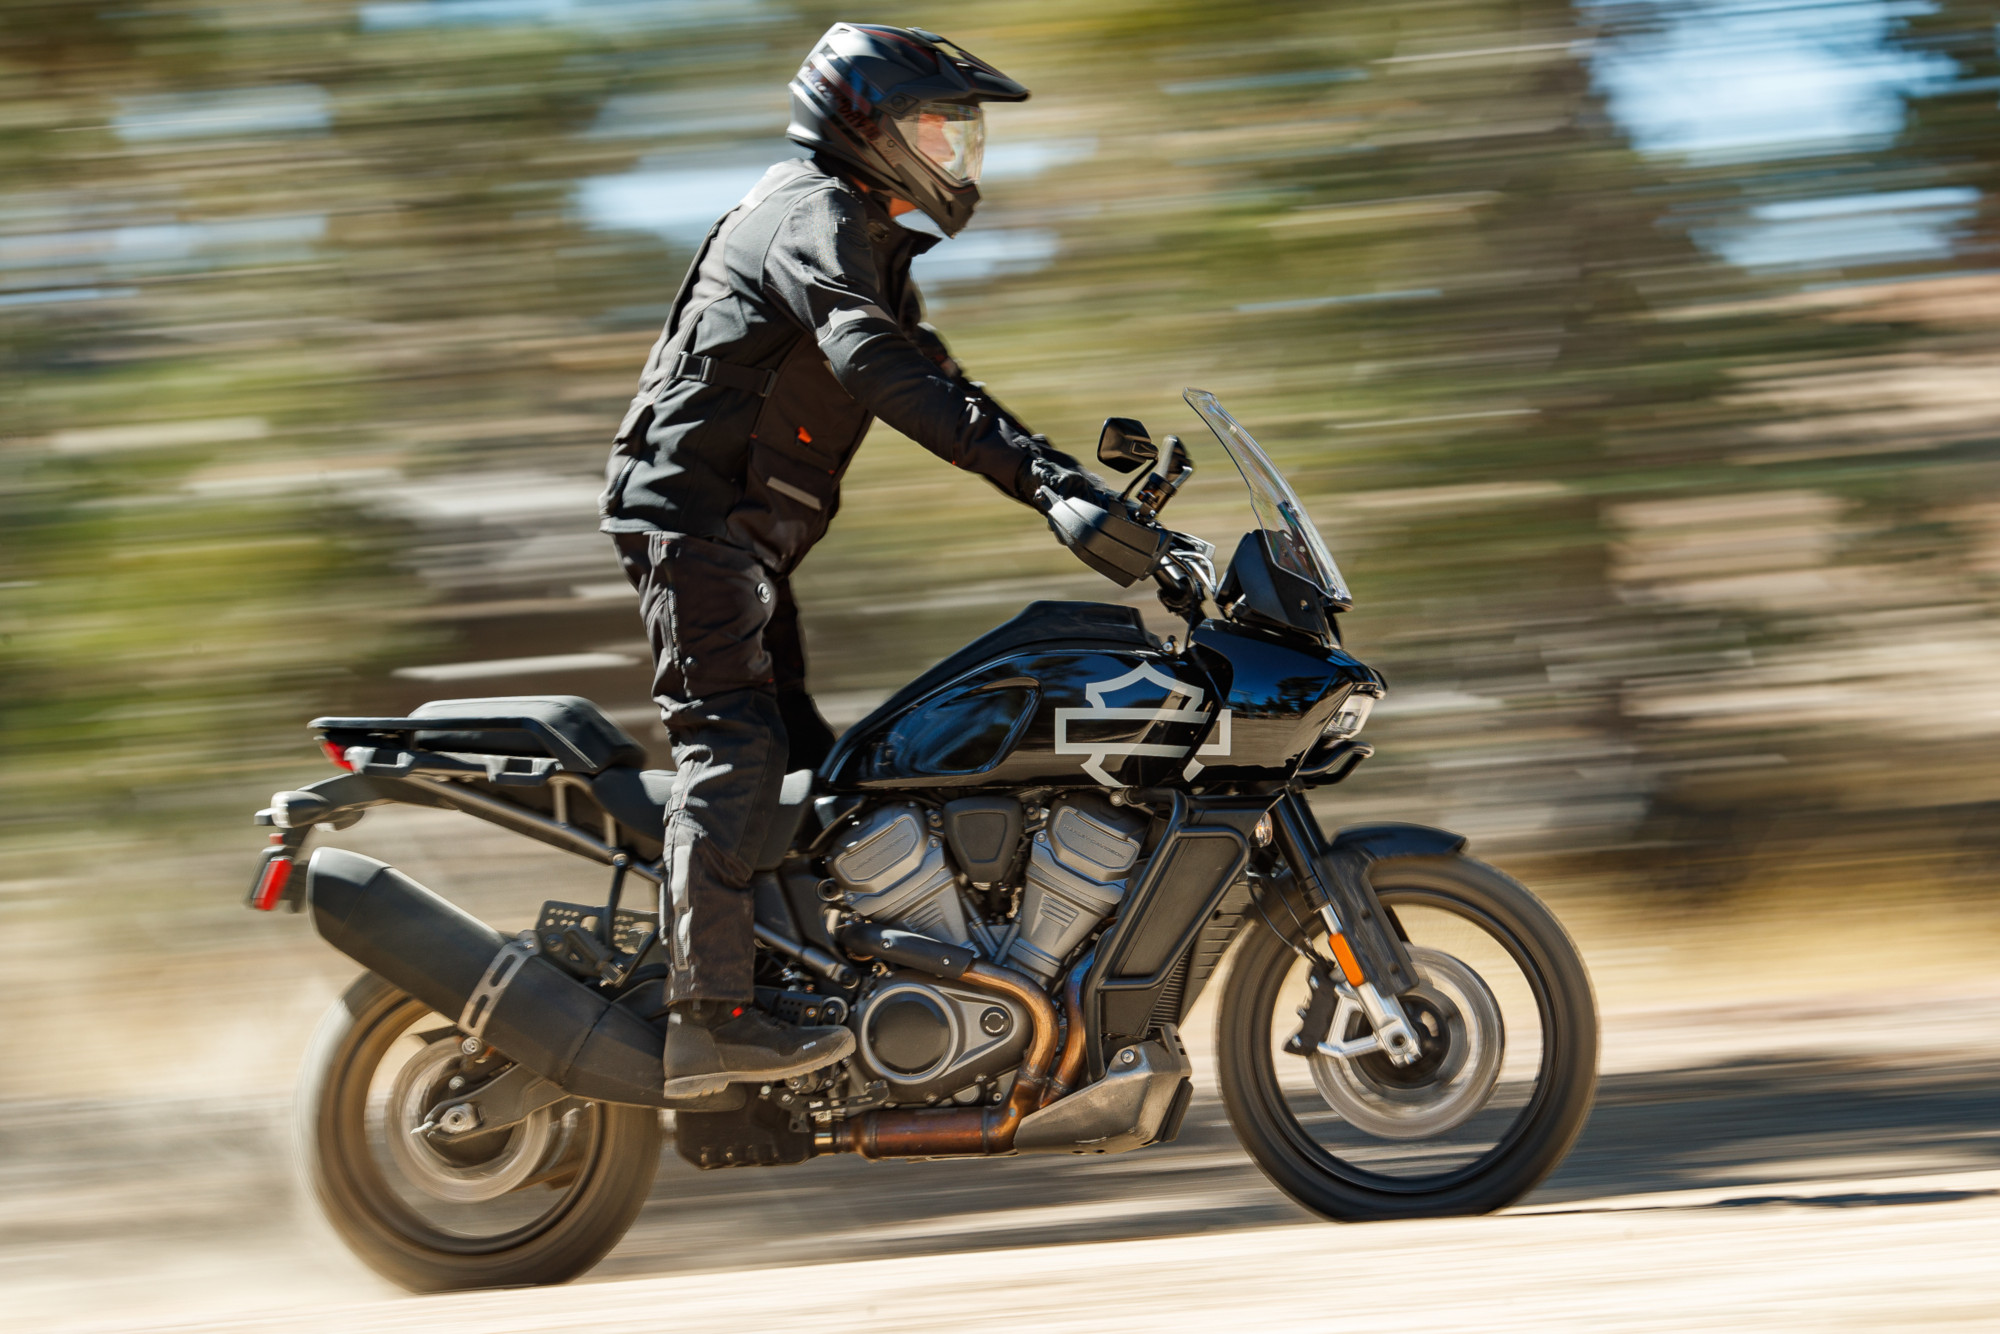 ¿Cuántas calorías quemas al andar en moto? Te sorprenderás